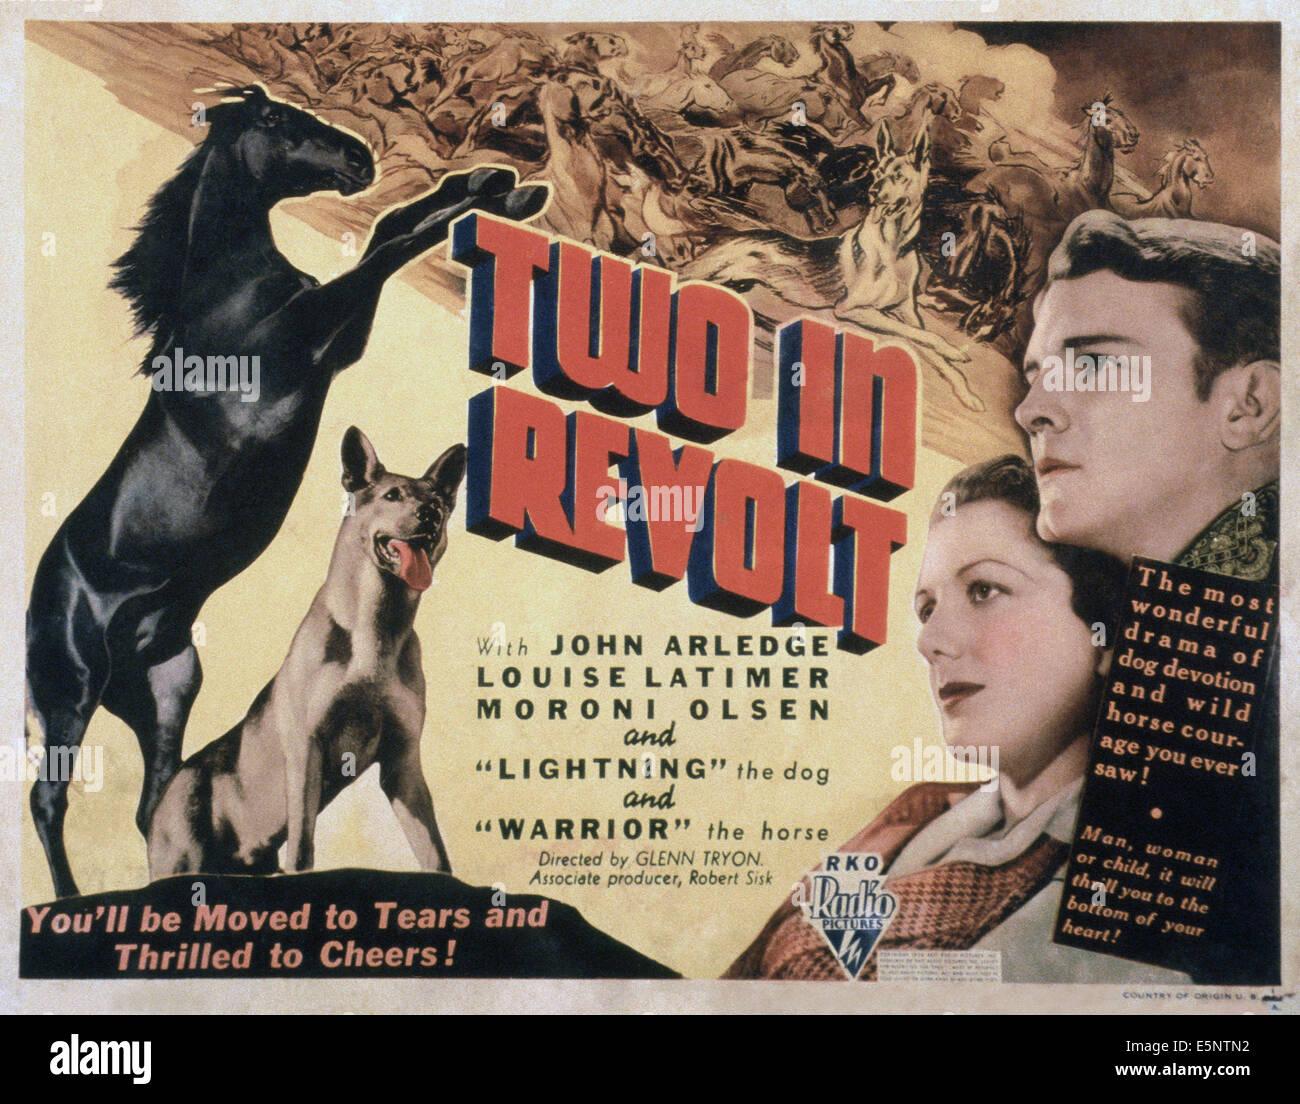 TWO IN REVOLT, US lobbycard, from left: Warrior the horse, Lightning the dog, Louise Latimer, John Arledge, 1936Stock Photo